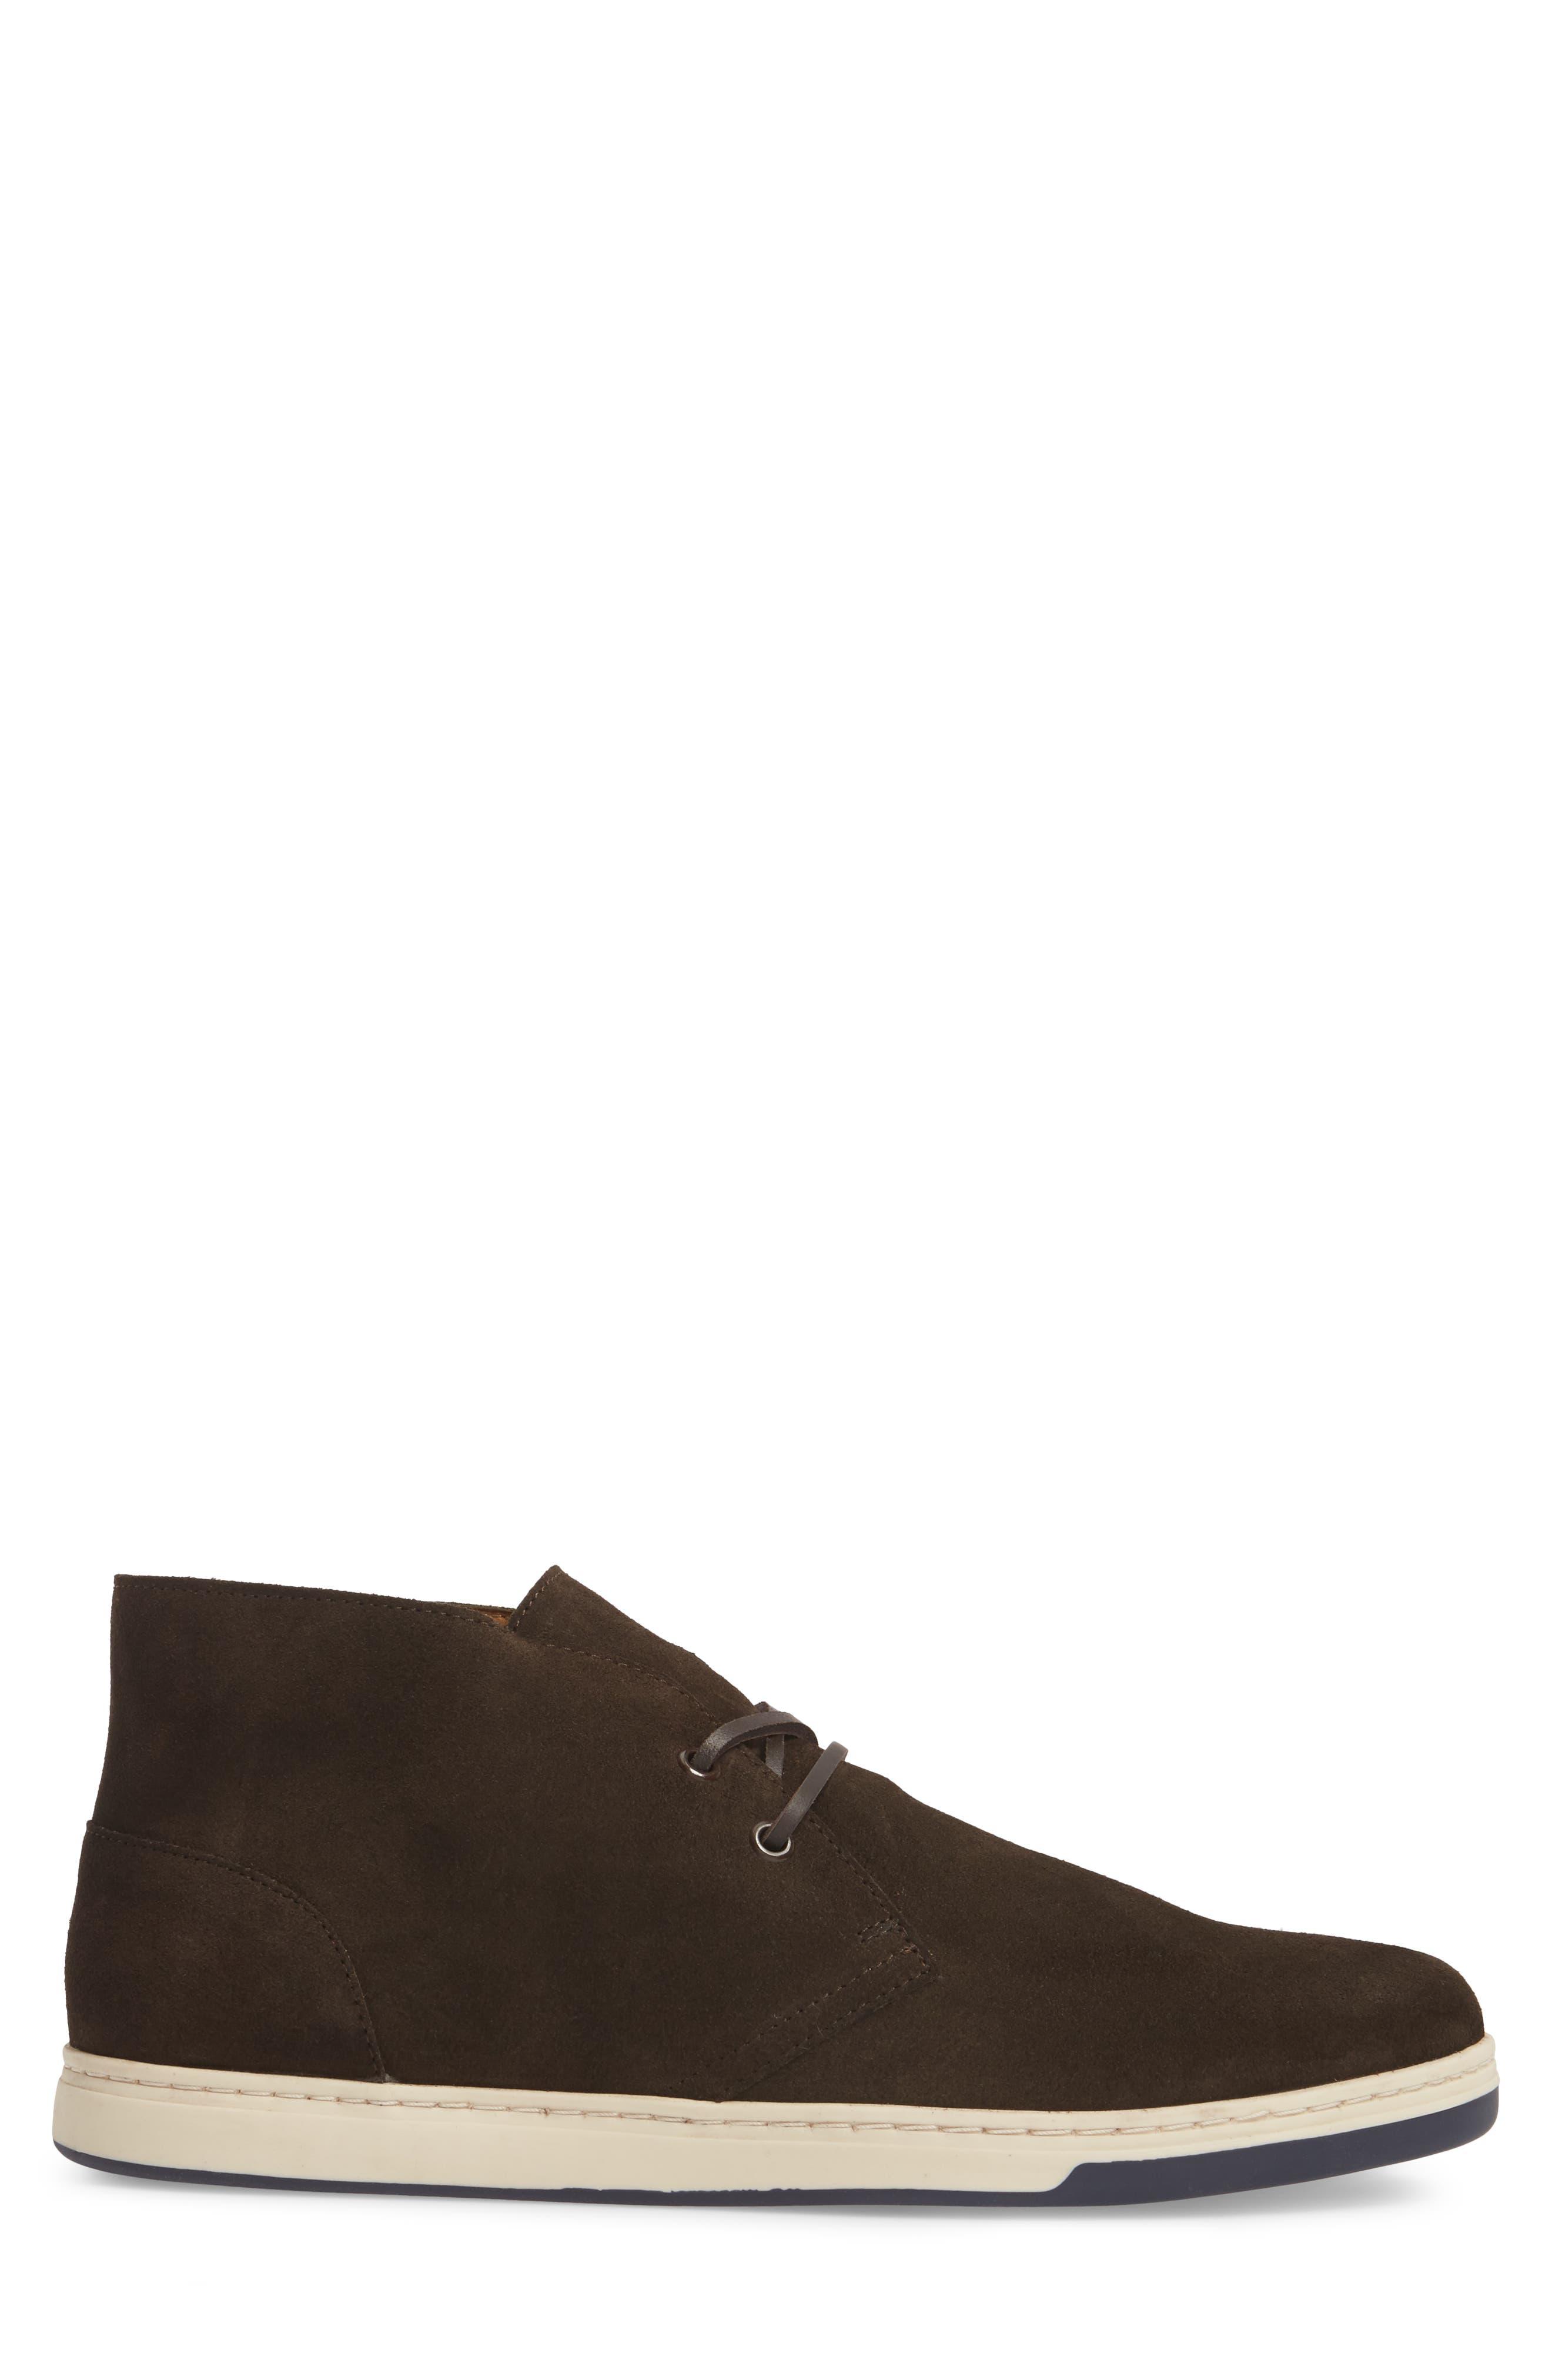 Alternate Image 3  - Austen Heller Berkleys Sneaker (Men)